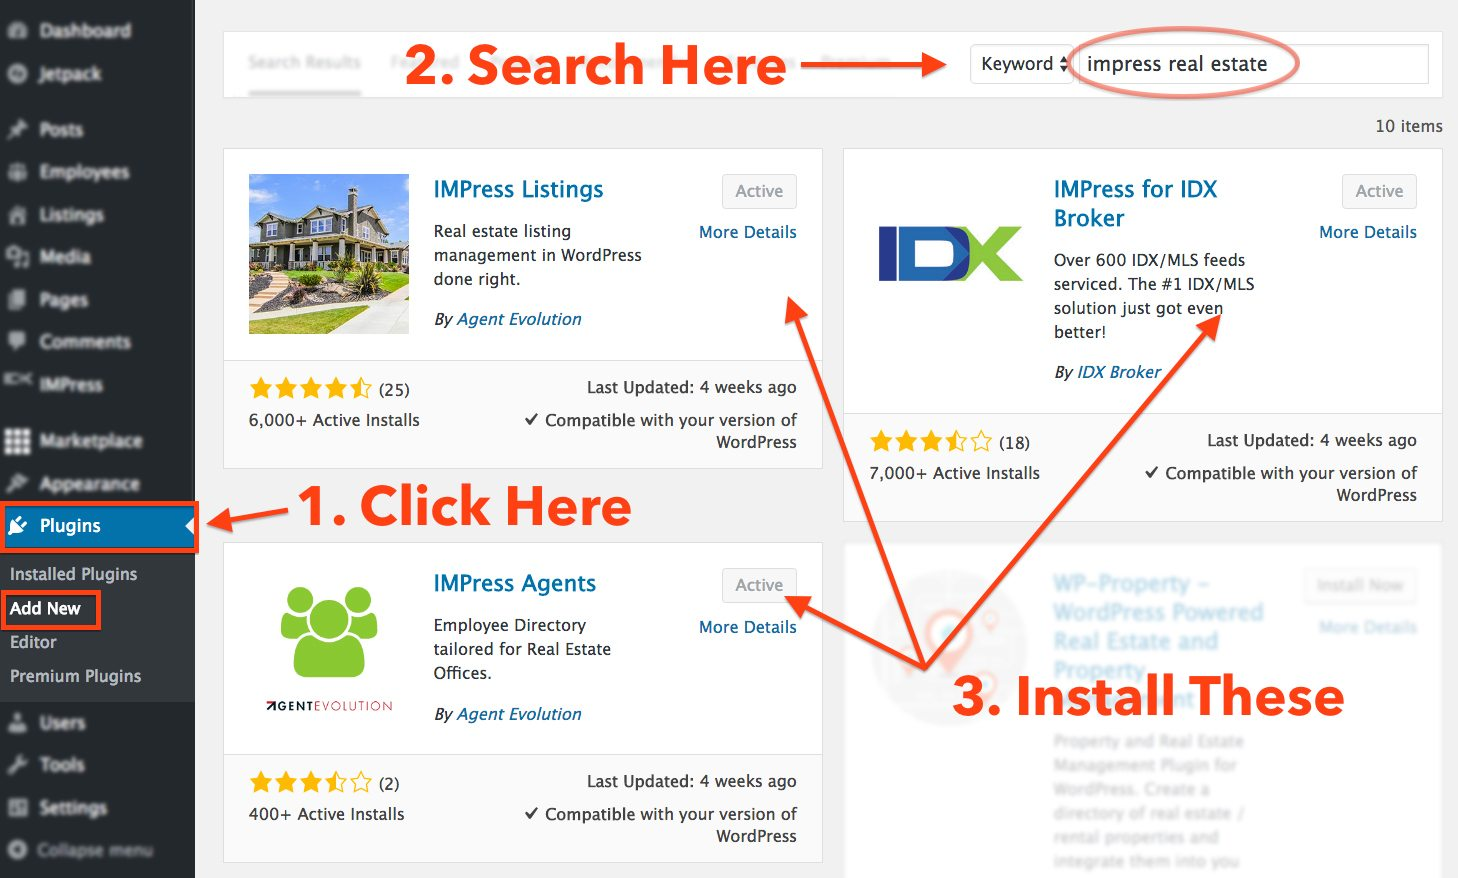 wp-impress-real-estate-plugins